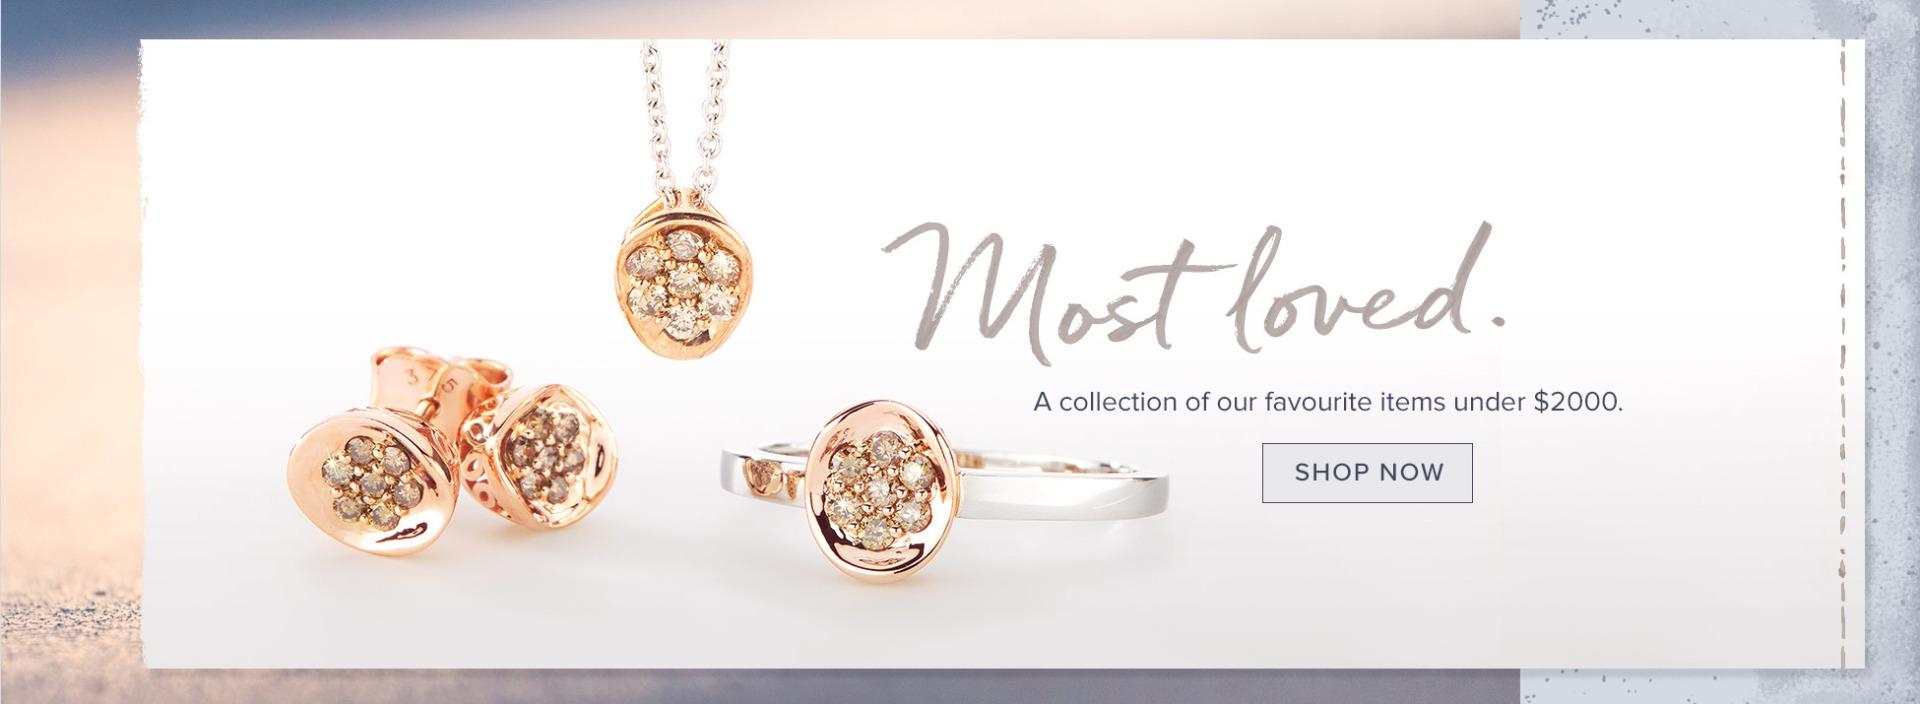 Nina's Most Loved - Diamond jewellery under $2000